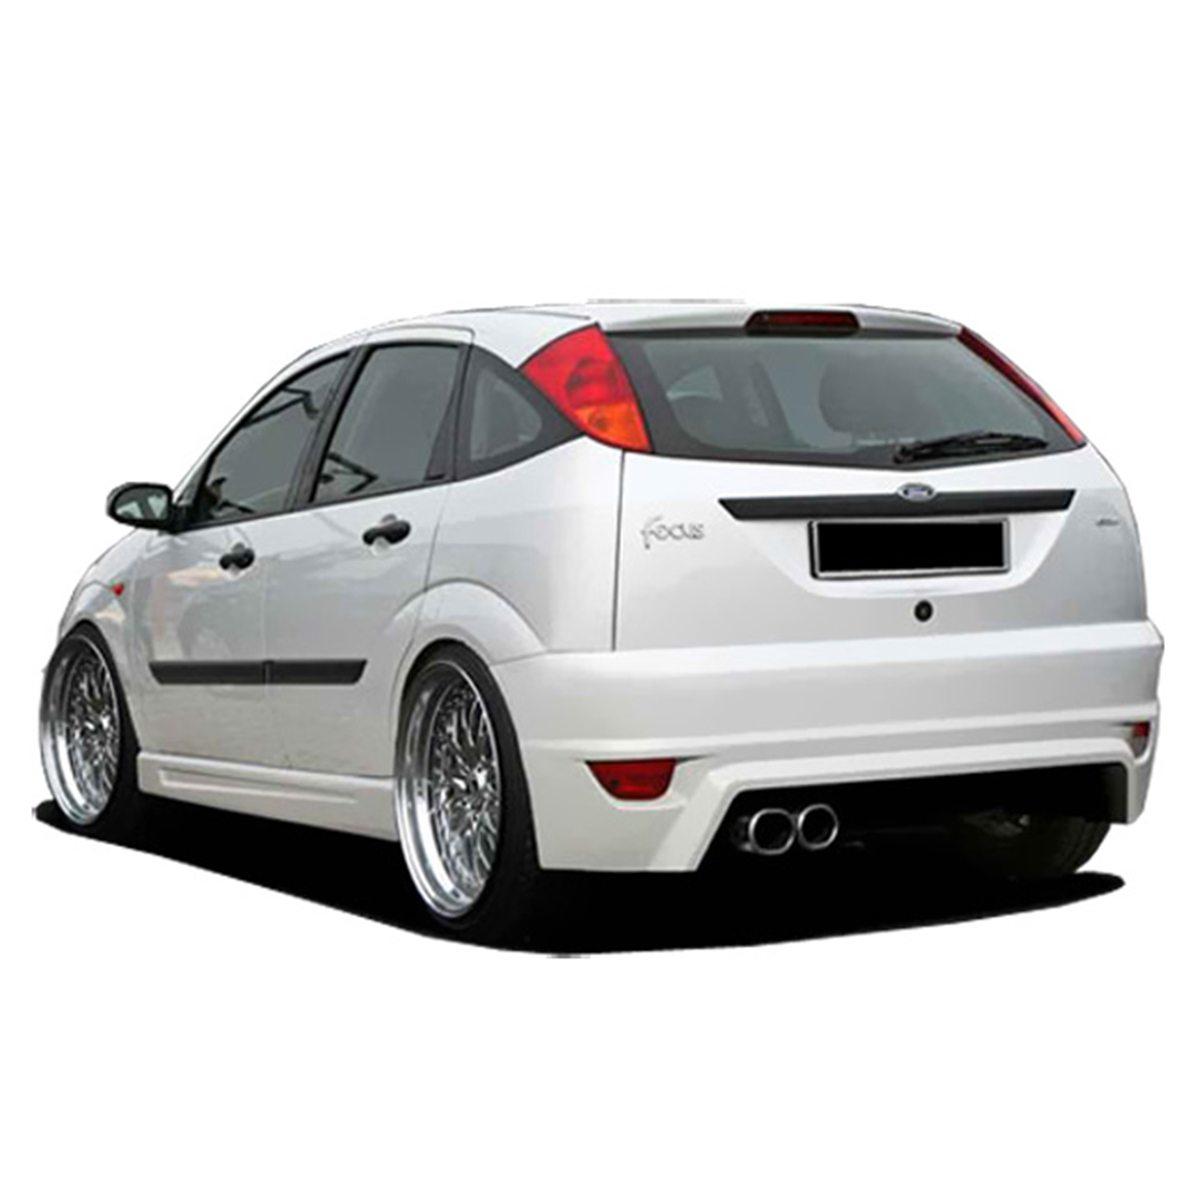 Ford-Focus-Hendrix-tras-PCS082